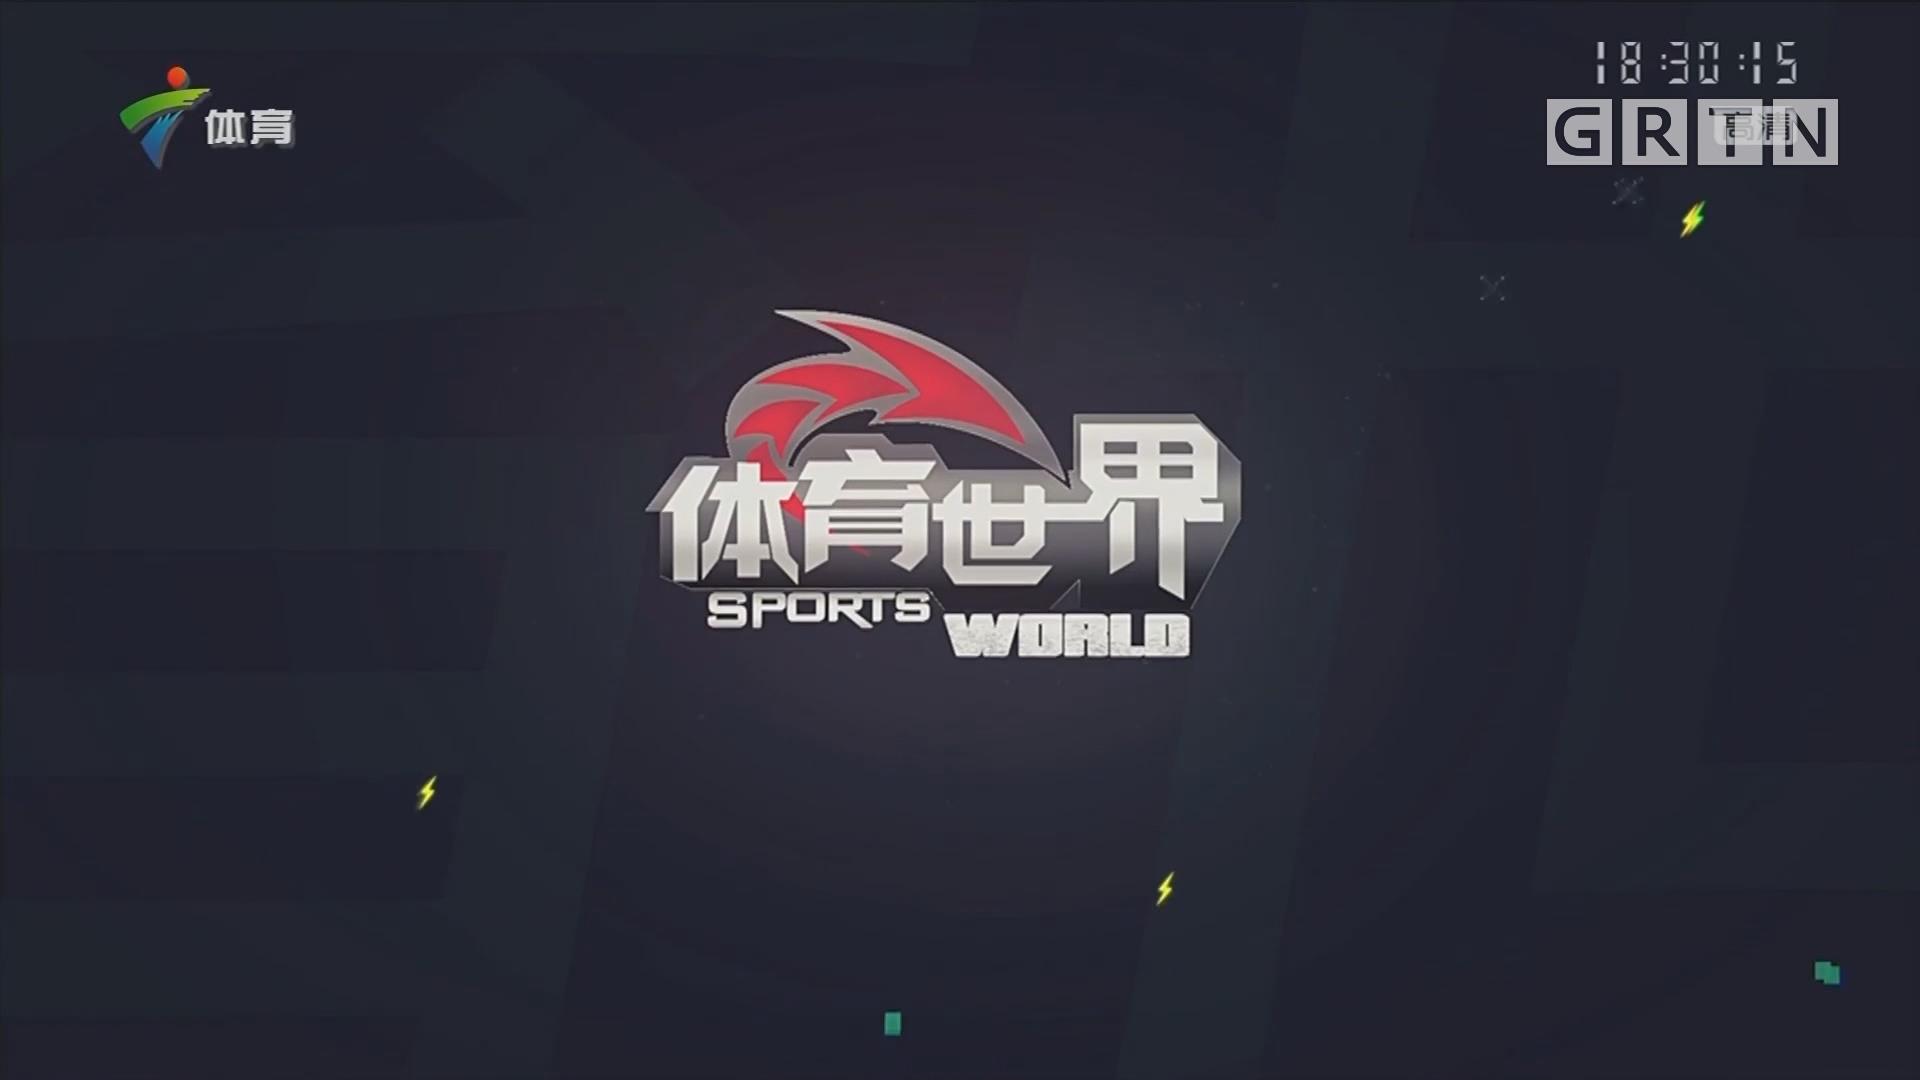 [HD][2018-11-02]体育世界:南粤古驿道定向大赛平远站周末鸣锣